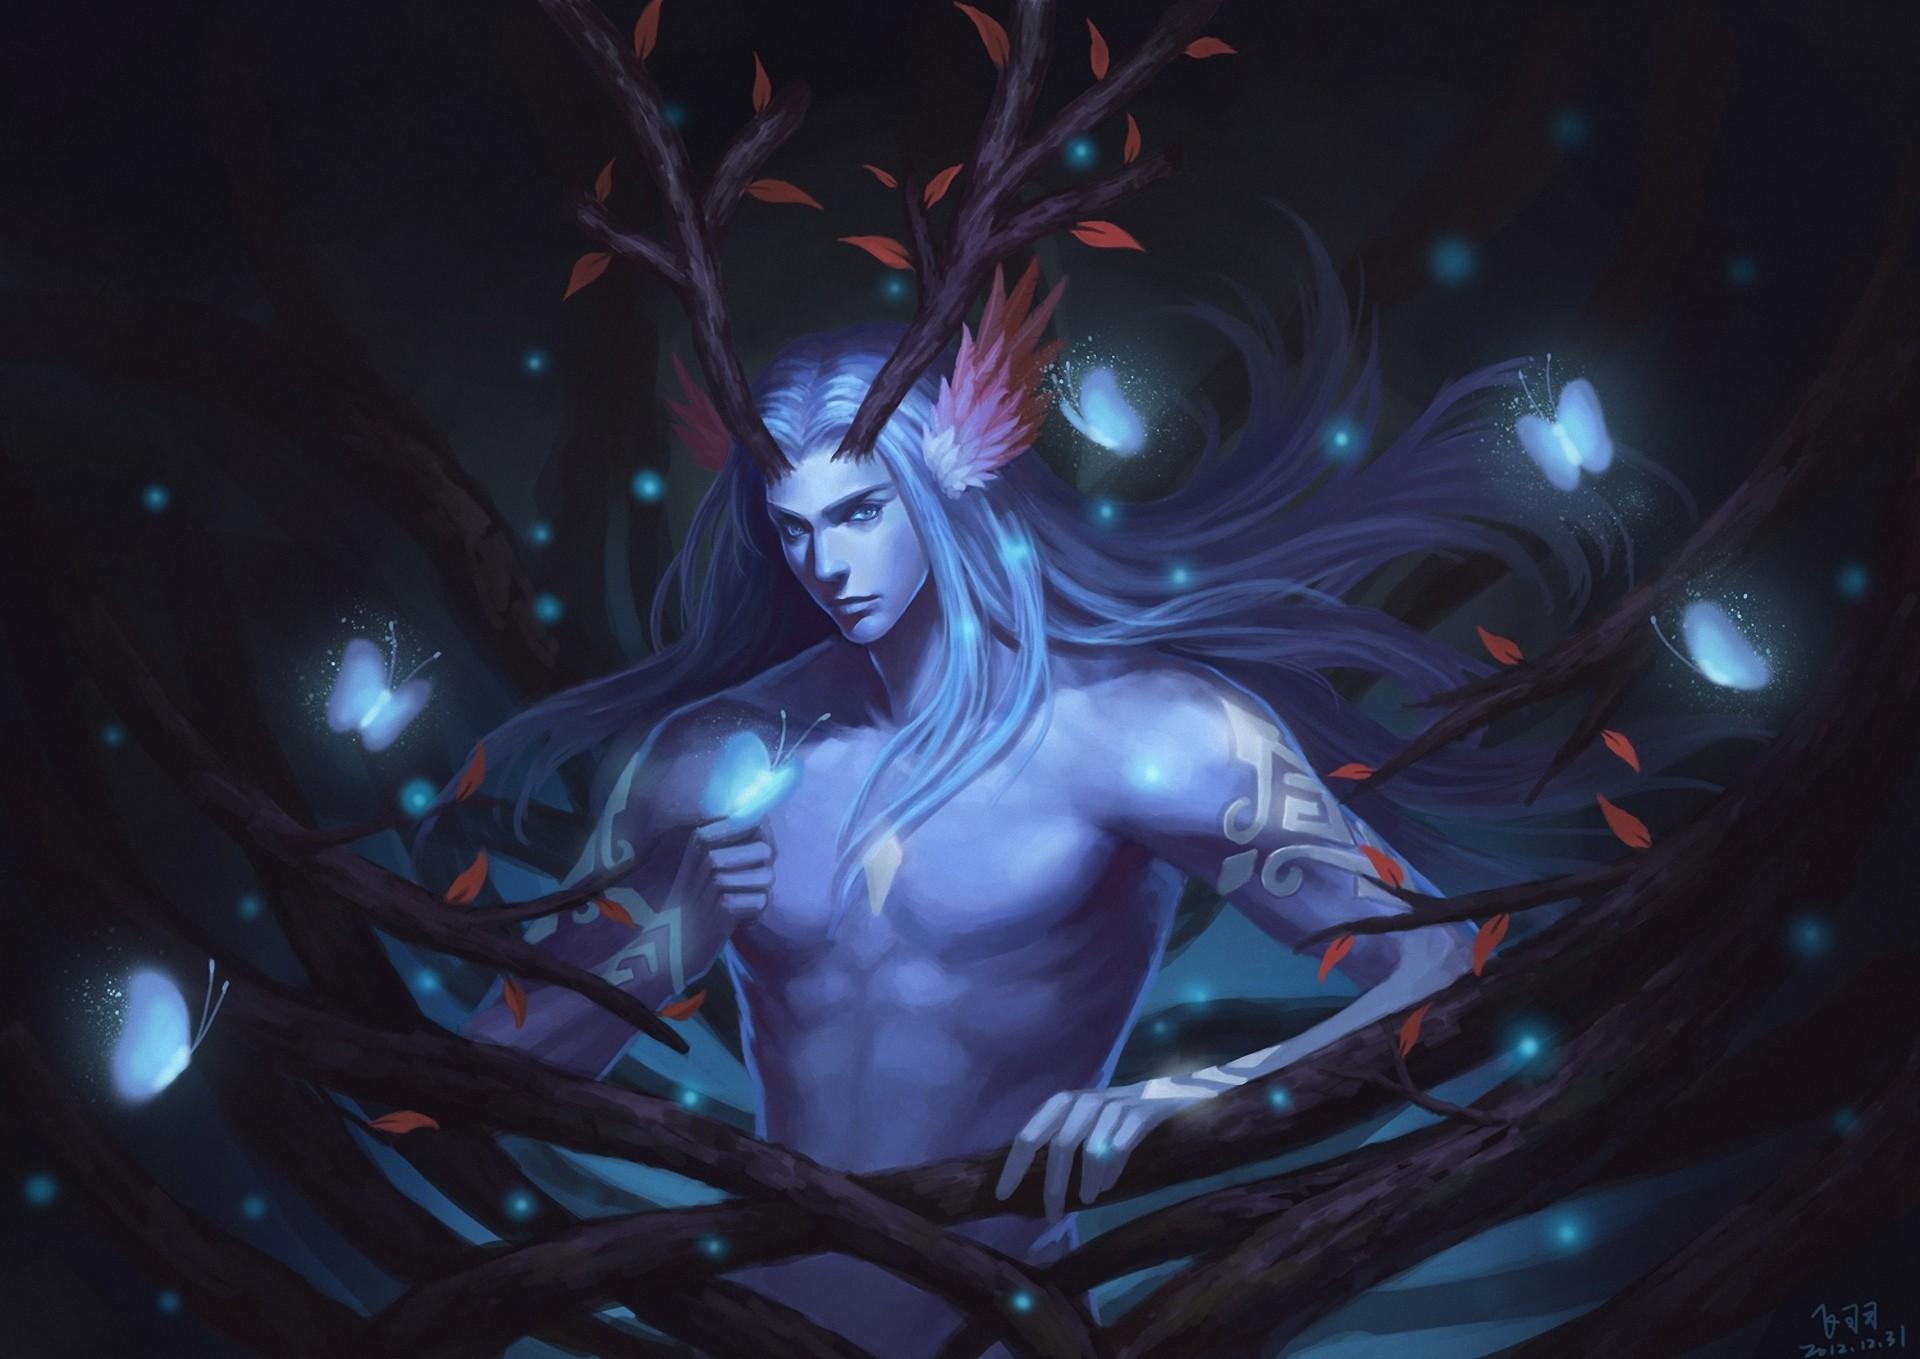 Supernatural beings Man Horns Fantasy wallpaper background